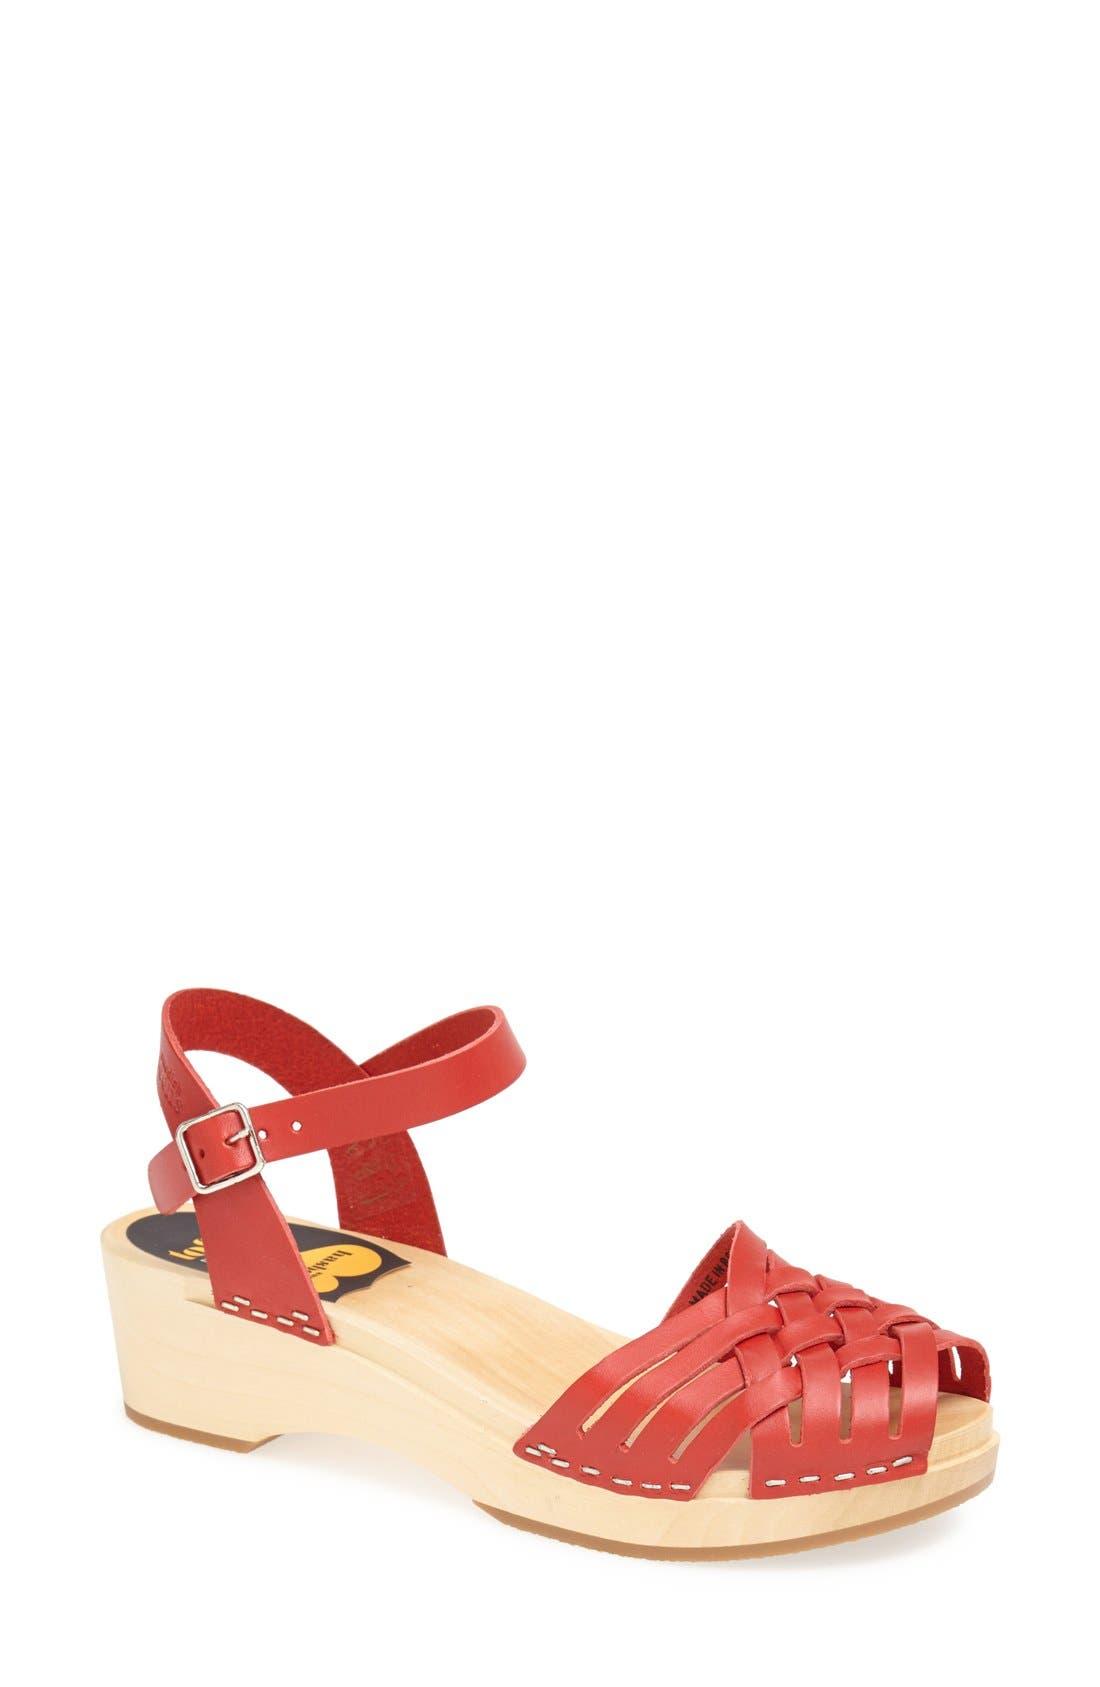 Main Image - Swedish Hasbeens Braided Sandal